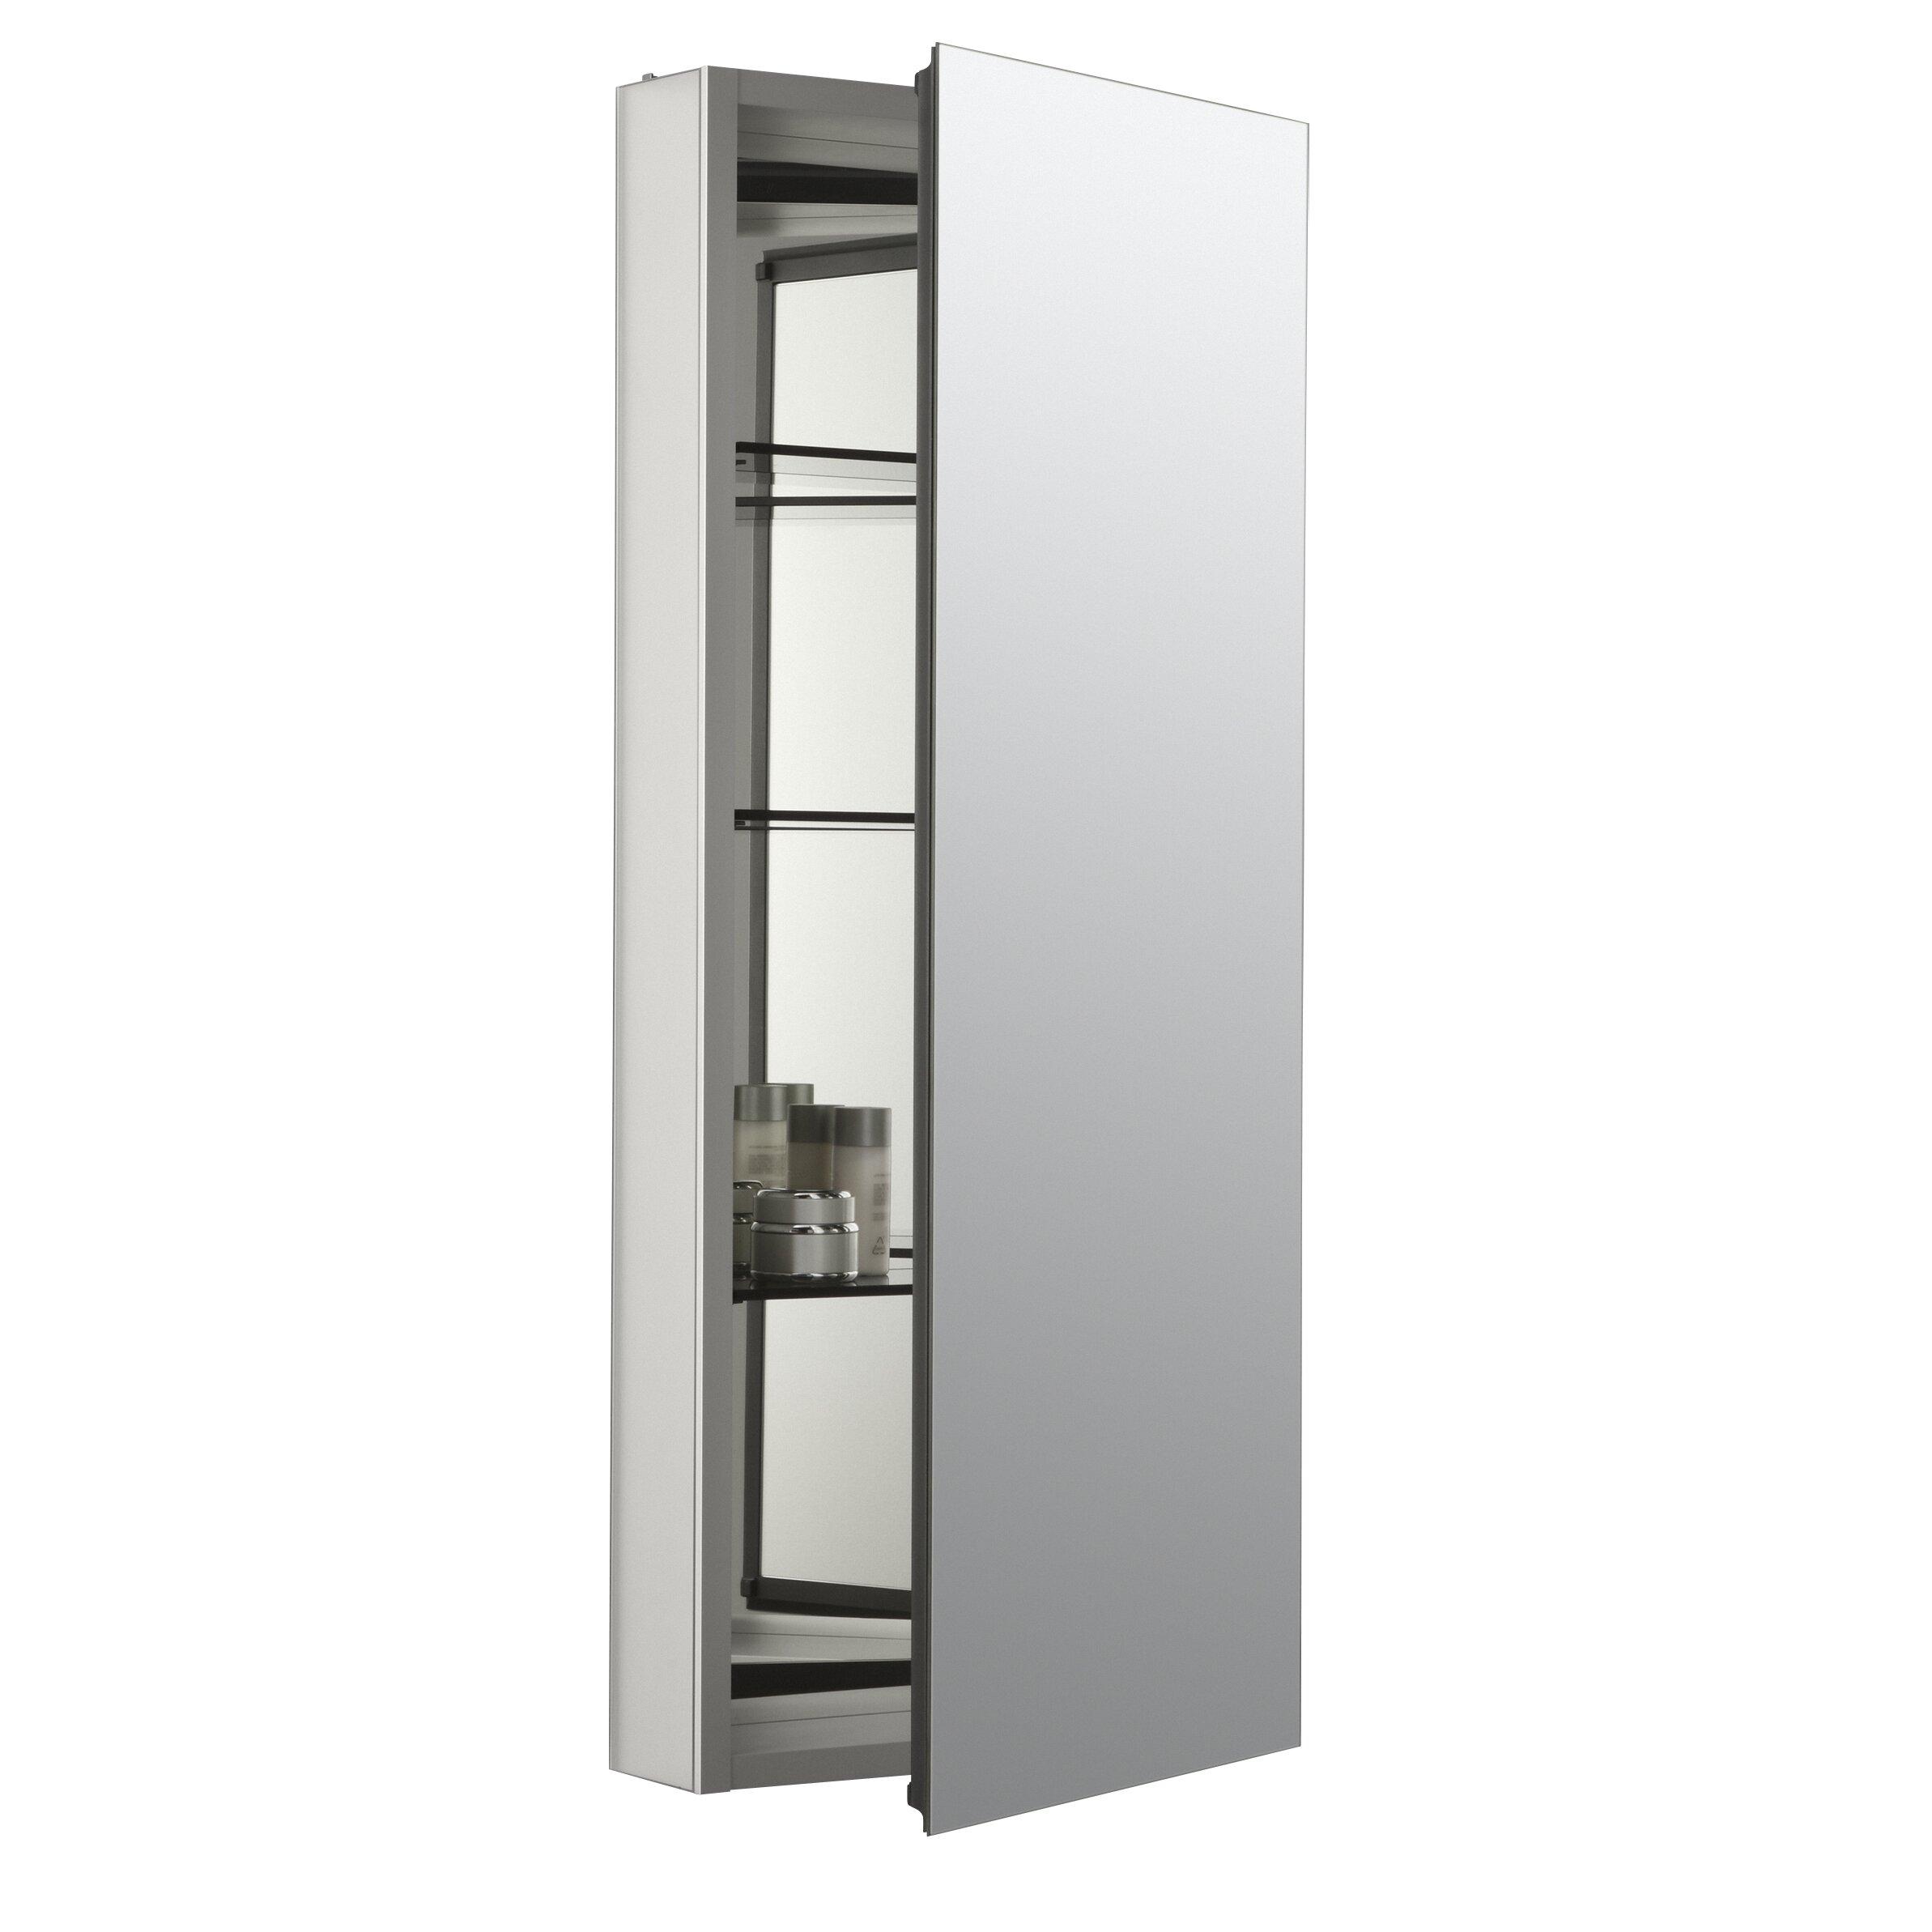 aluminum single door medicine cabinet with 107 degree hinge by kohler